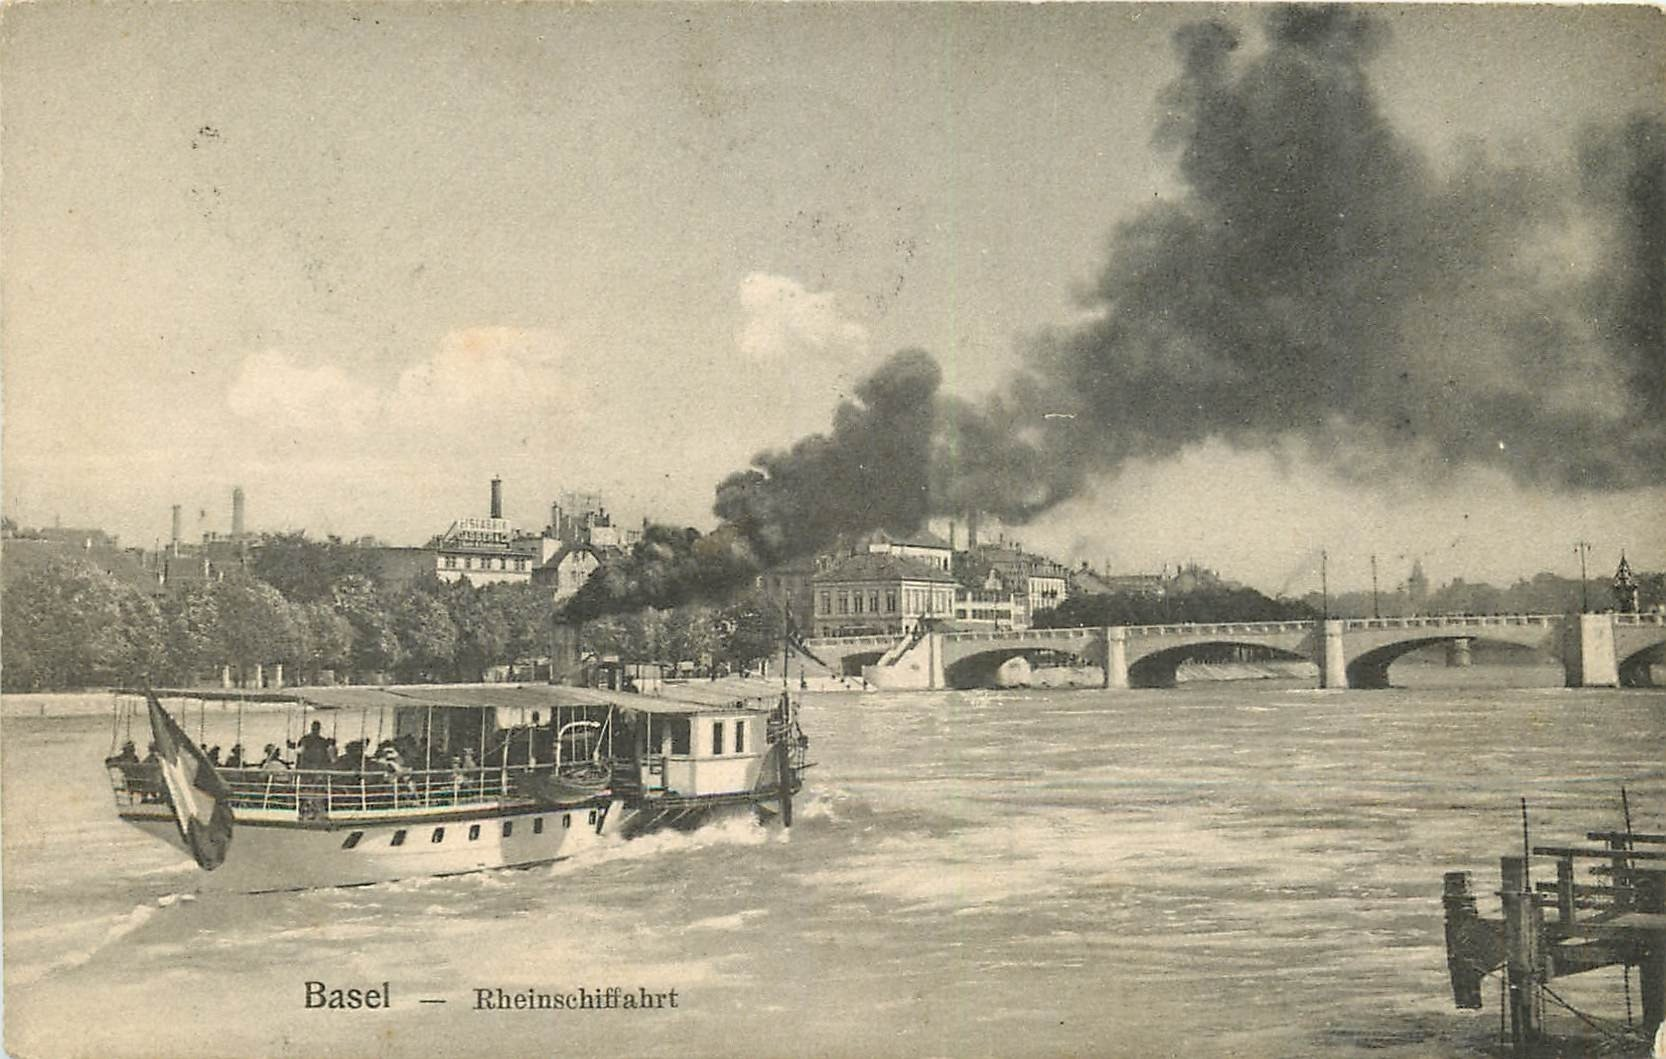 WW BASEL BALE. Rheinschiffahrt 1909